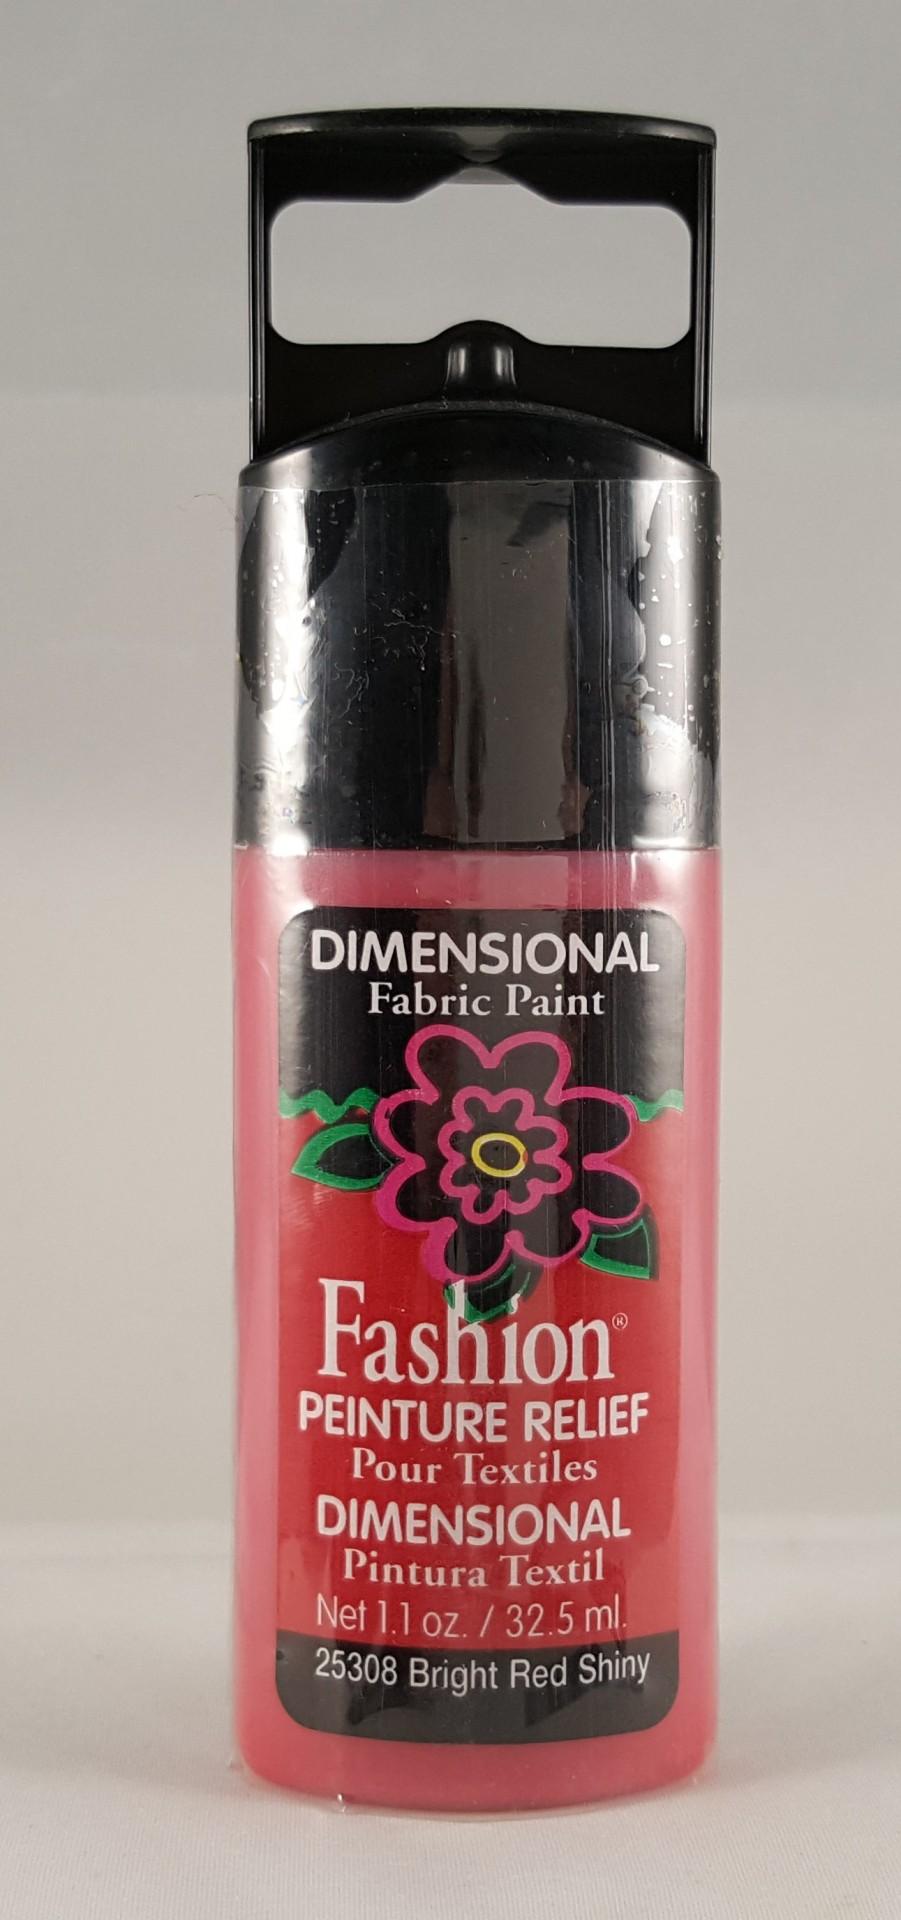 Tinta Dimensional para Tecido Fashion bright red shiny